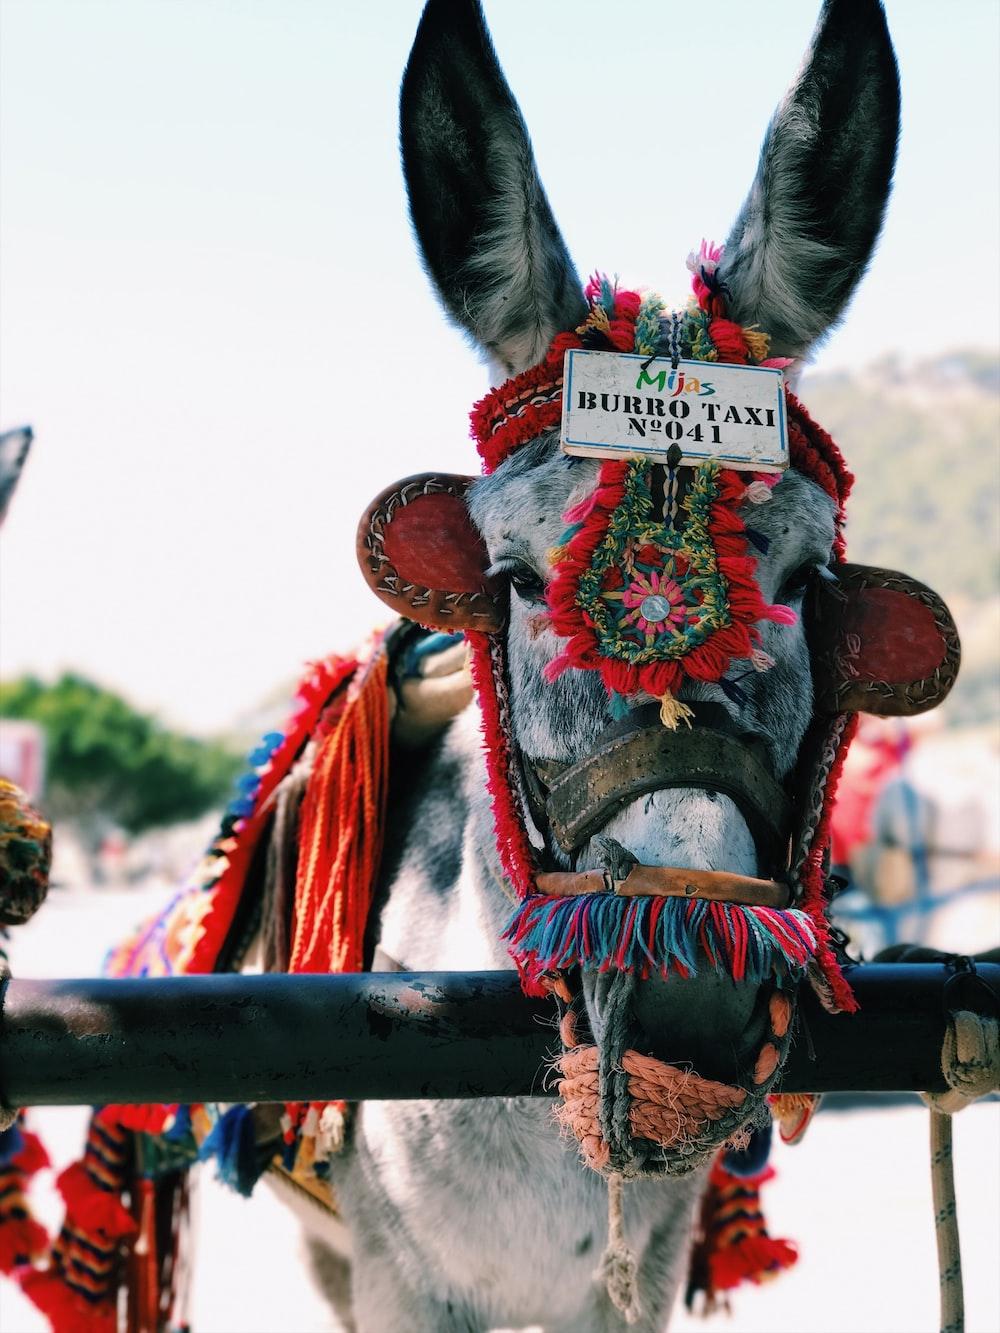 white and black donkey near black bar